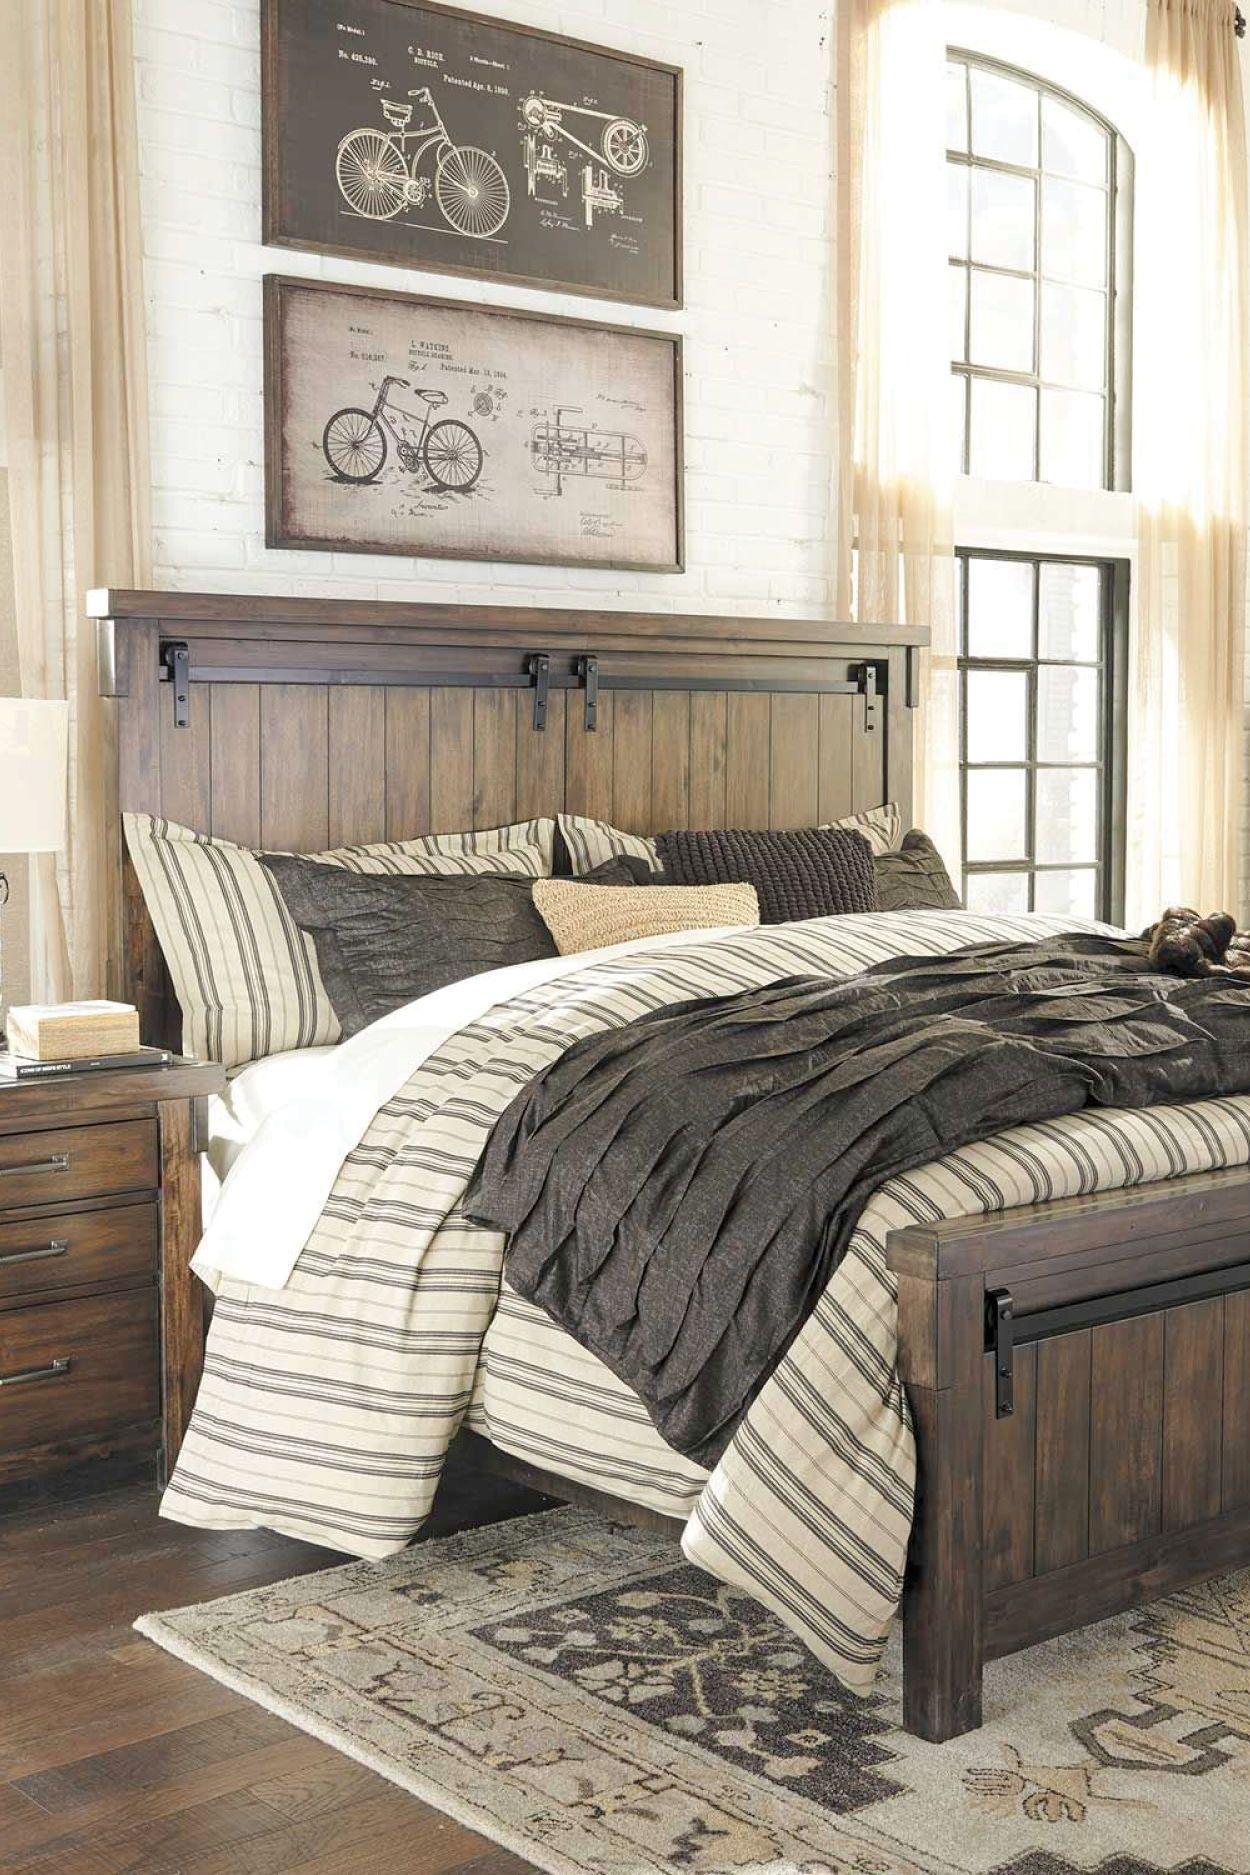 Lakeleigh 5 Piece Bedroom Set With Images Rustic Bedroom